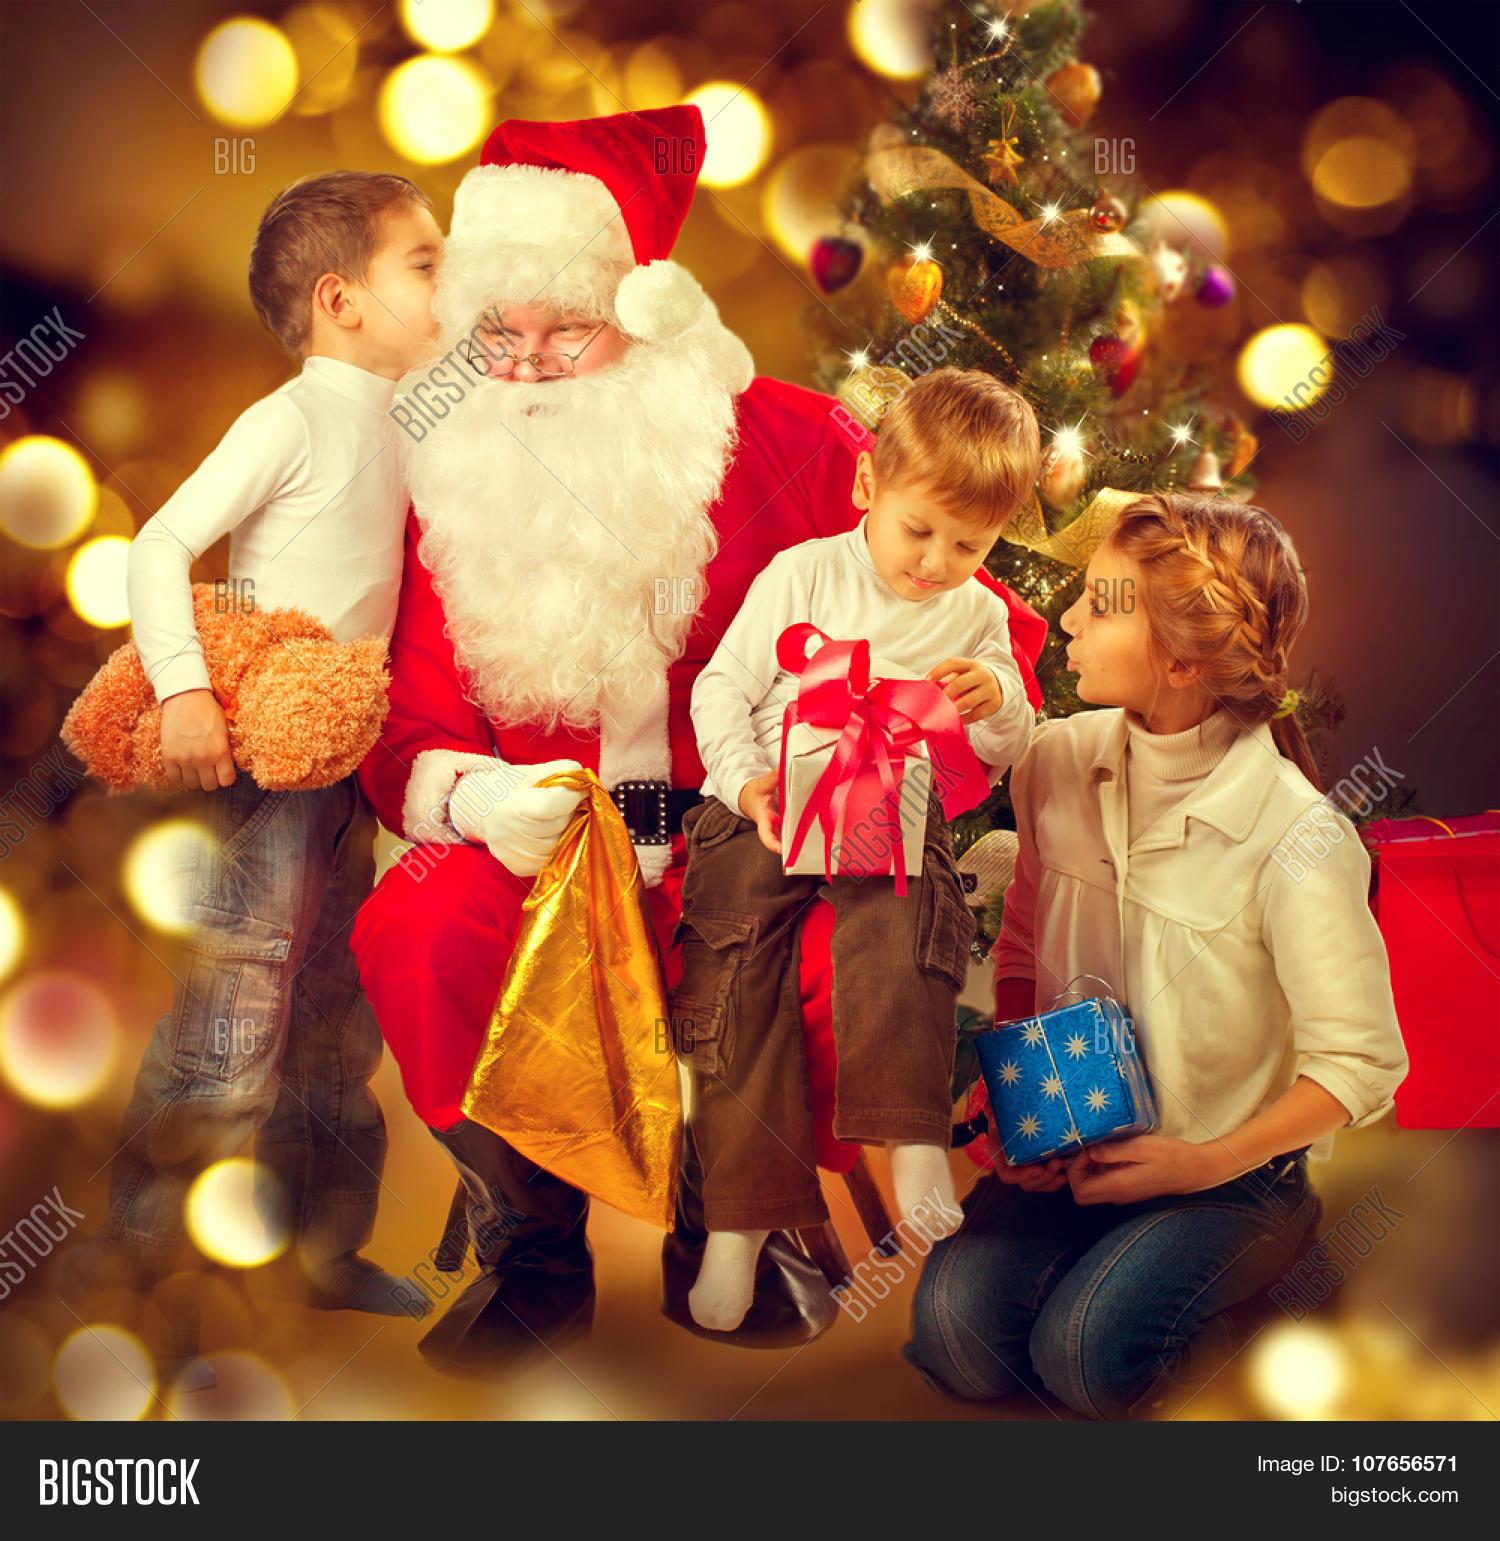 Christmas Gifts Toddlers: Santa Claus Giving Christmas Gifts Image & Photo